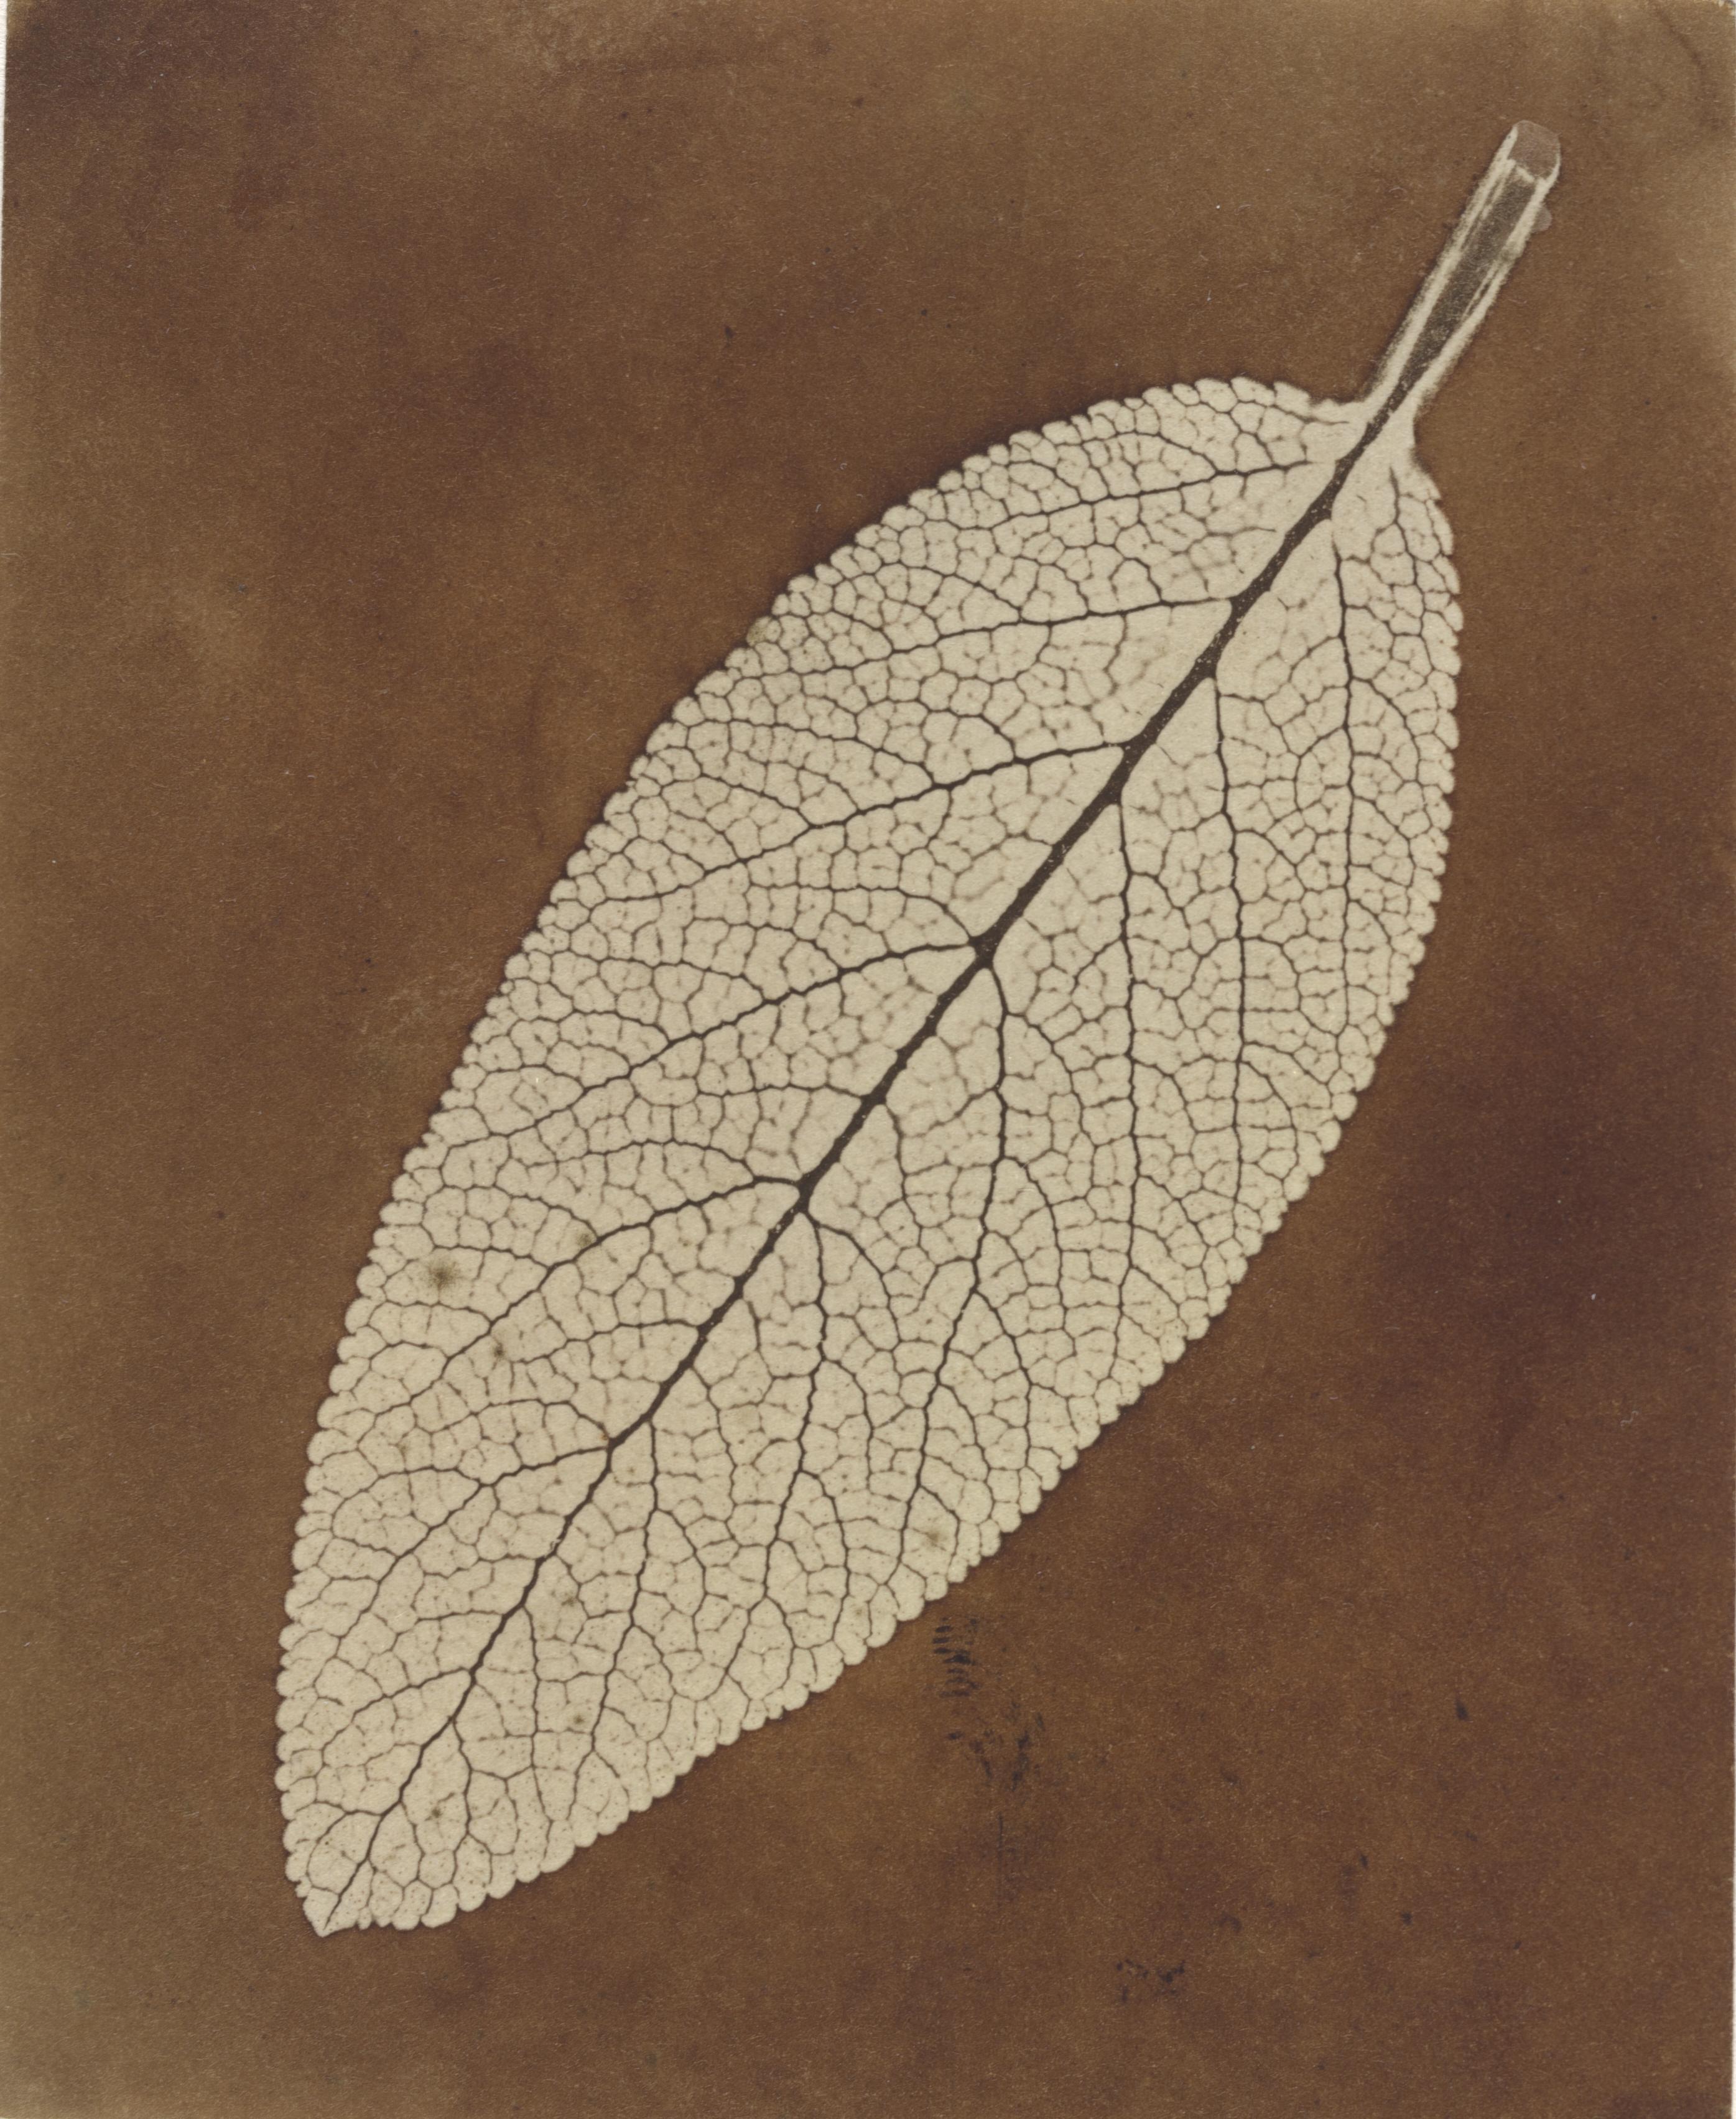 File:William Henry Fox Talbot, Leaf Study, 1839-1840, NGA 92376.jpg